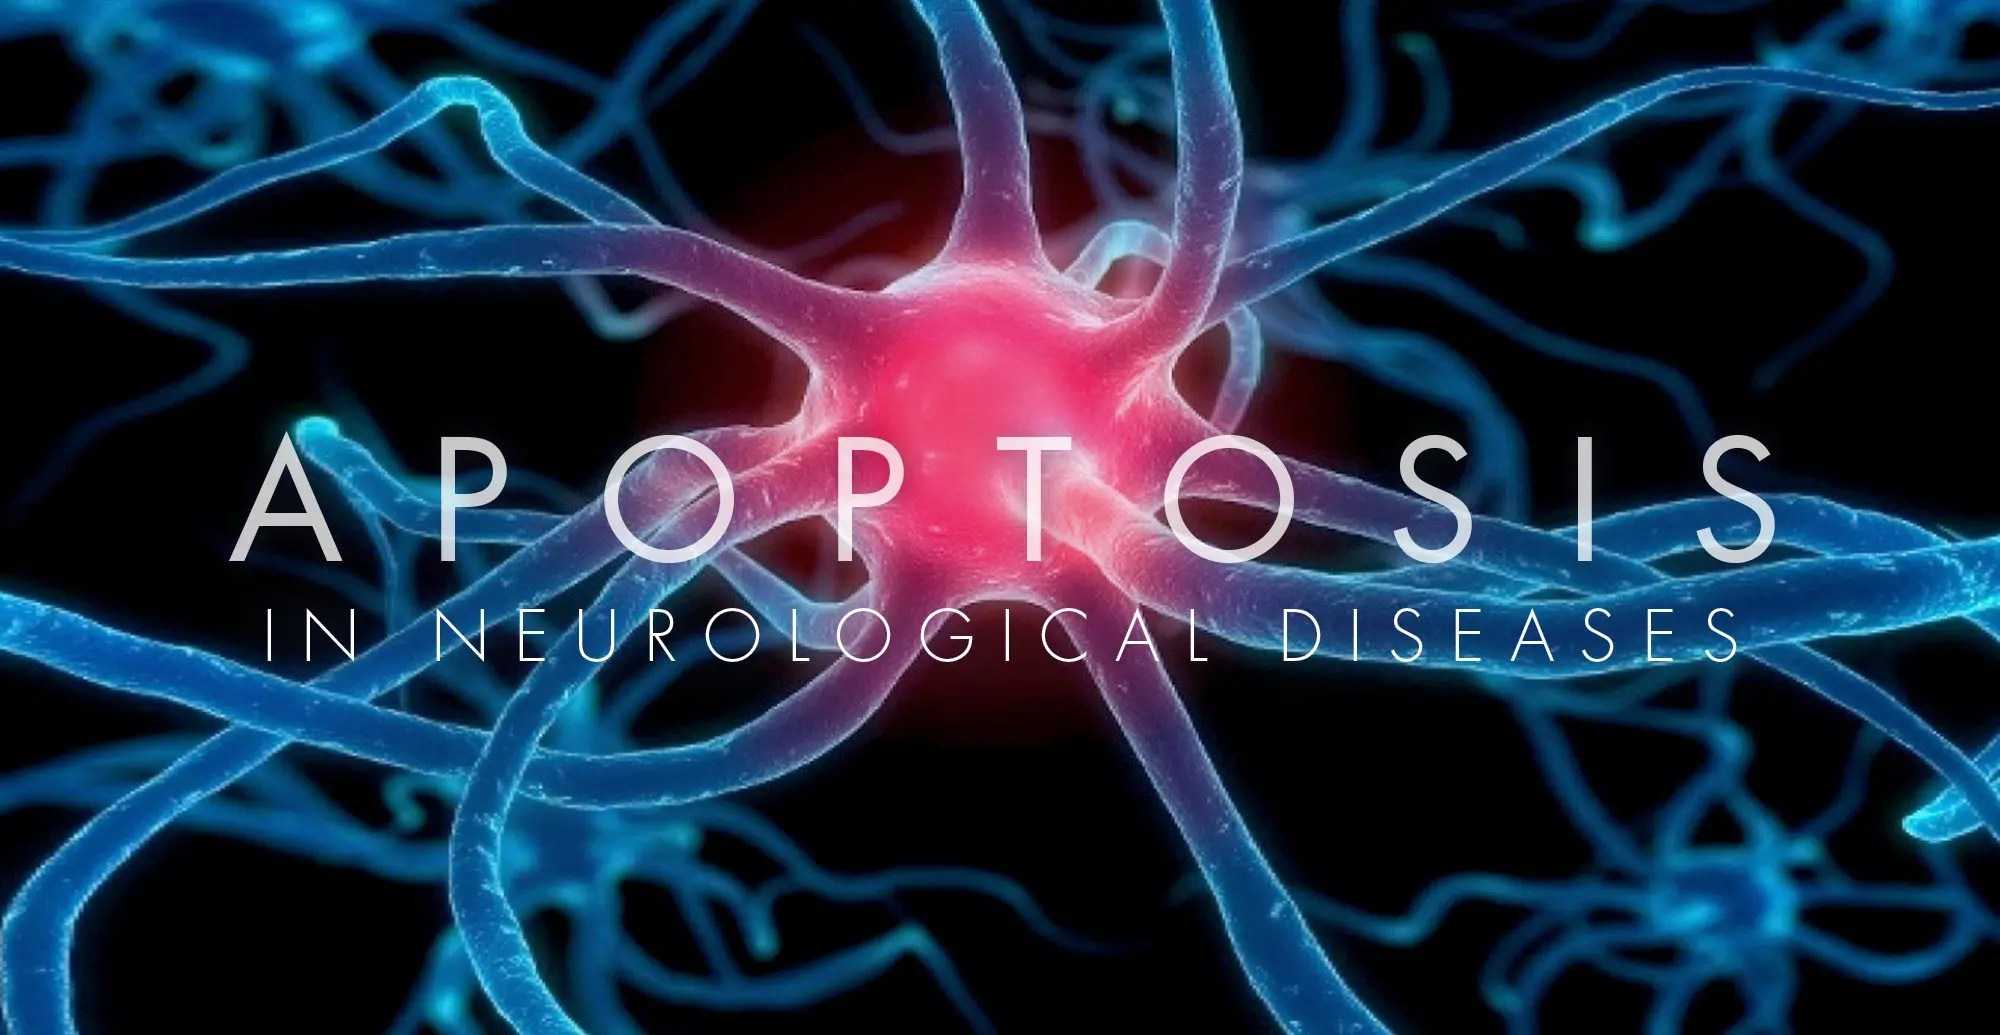 Apoptosis in Neurological Diseases